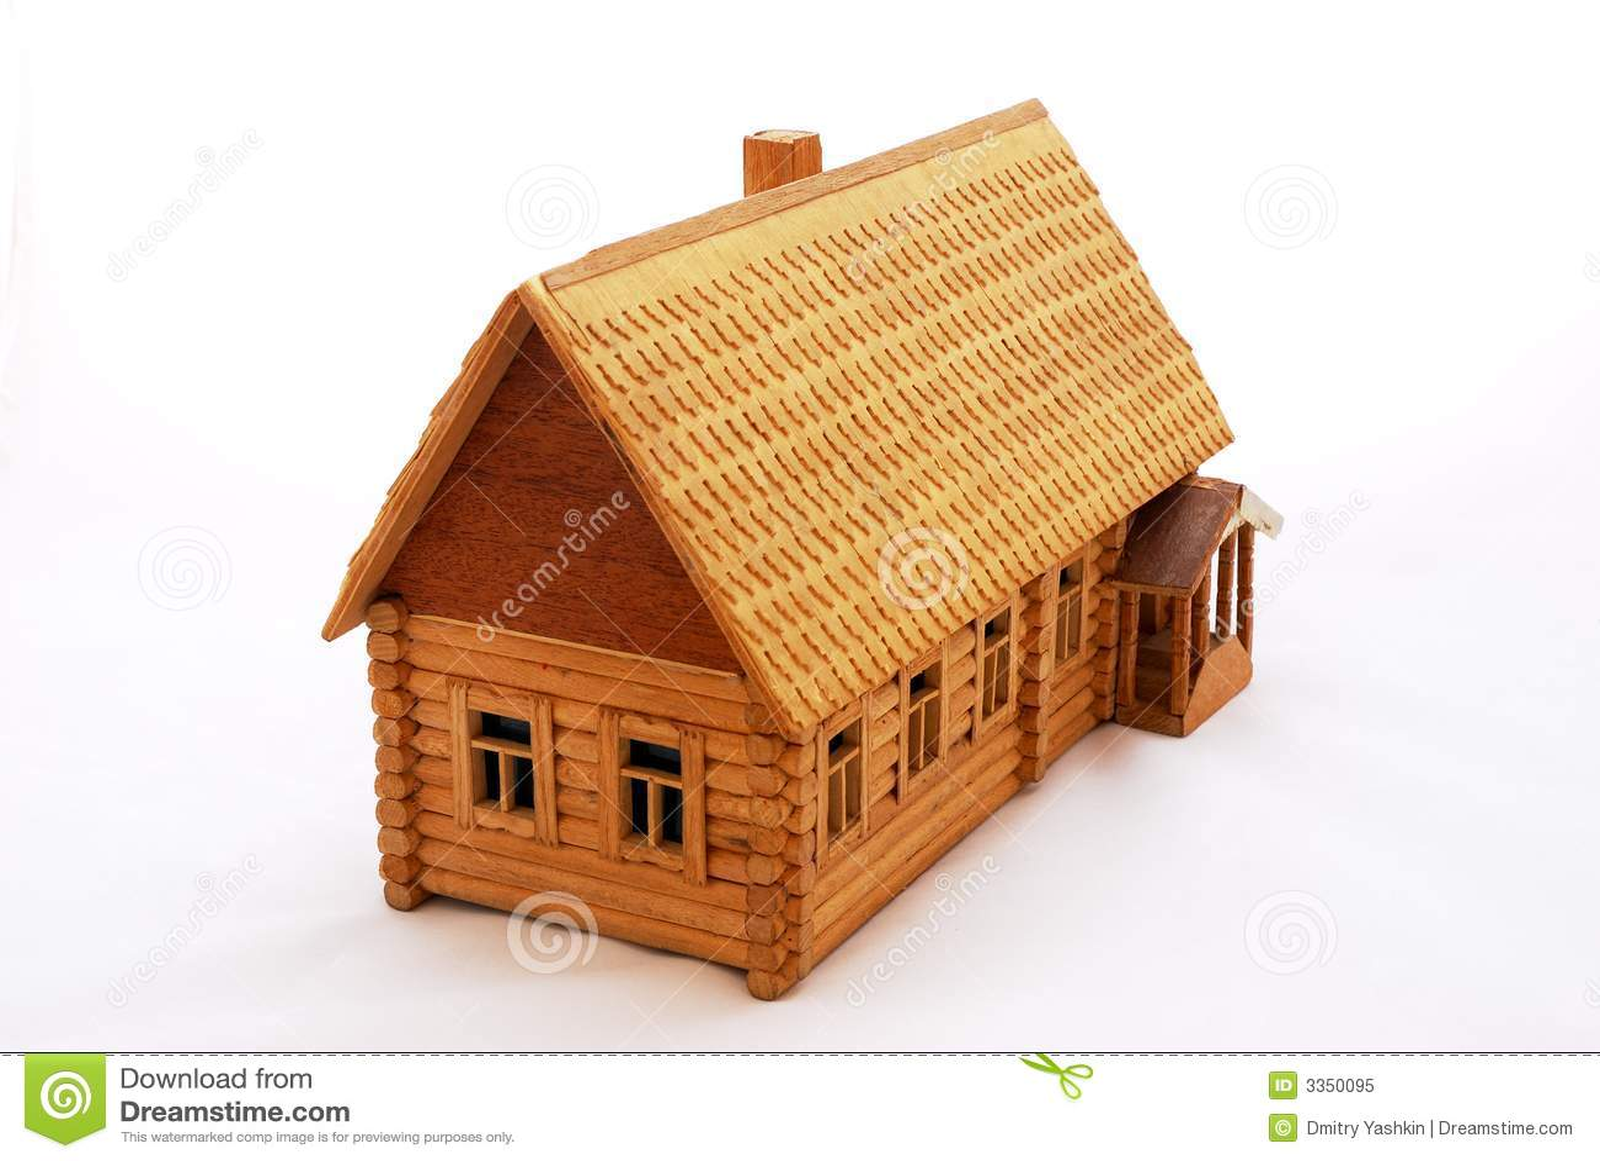 Close-up wood house